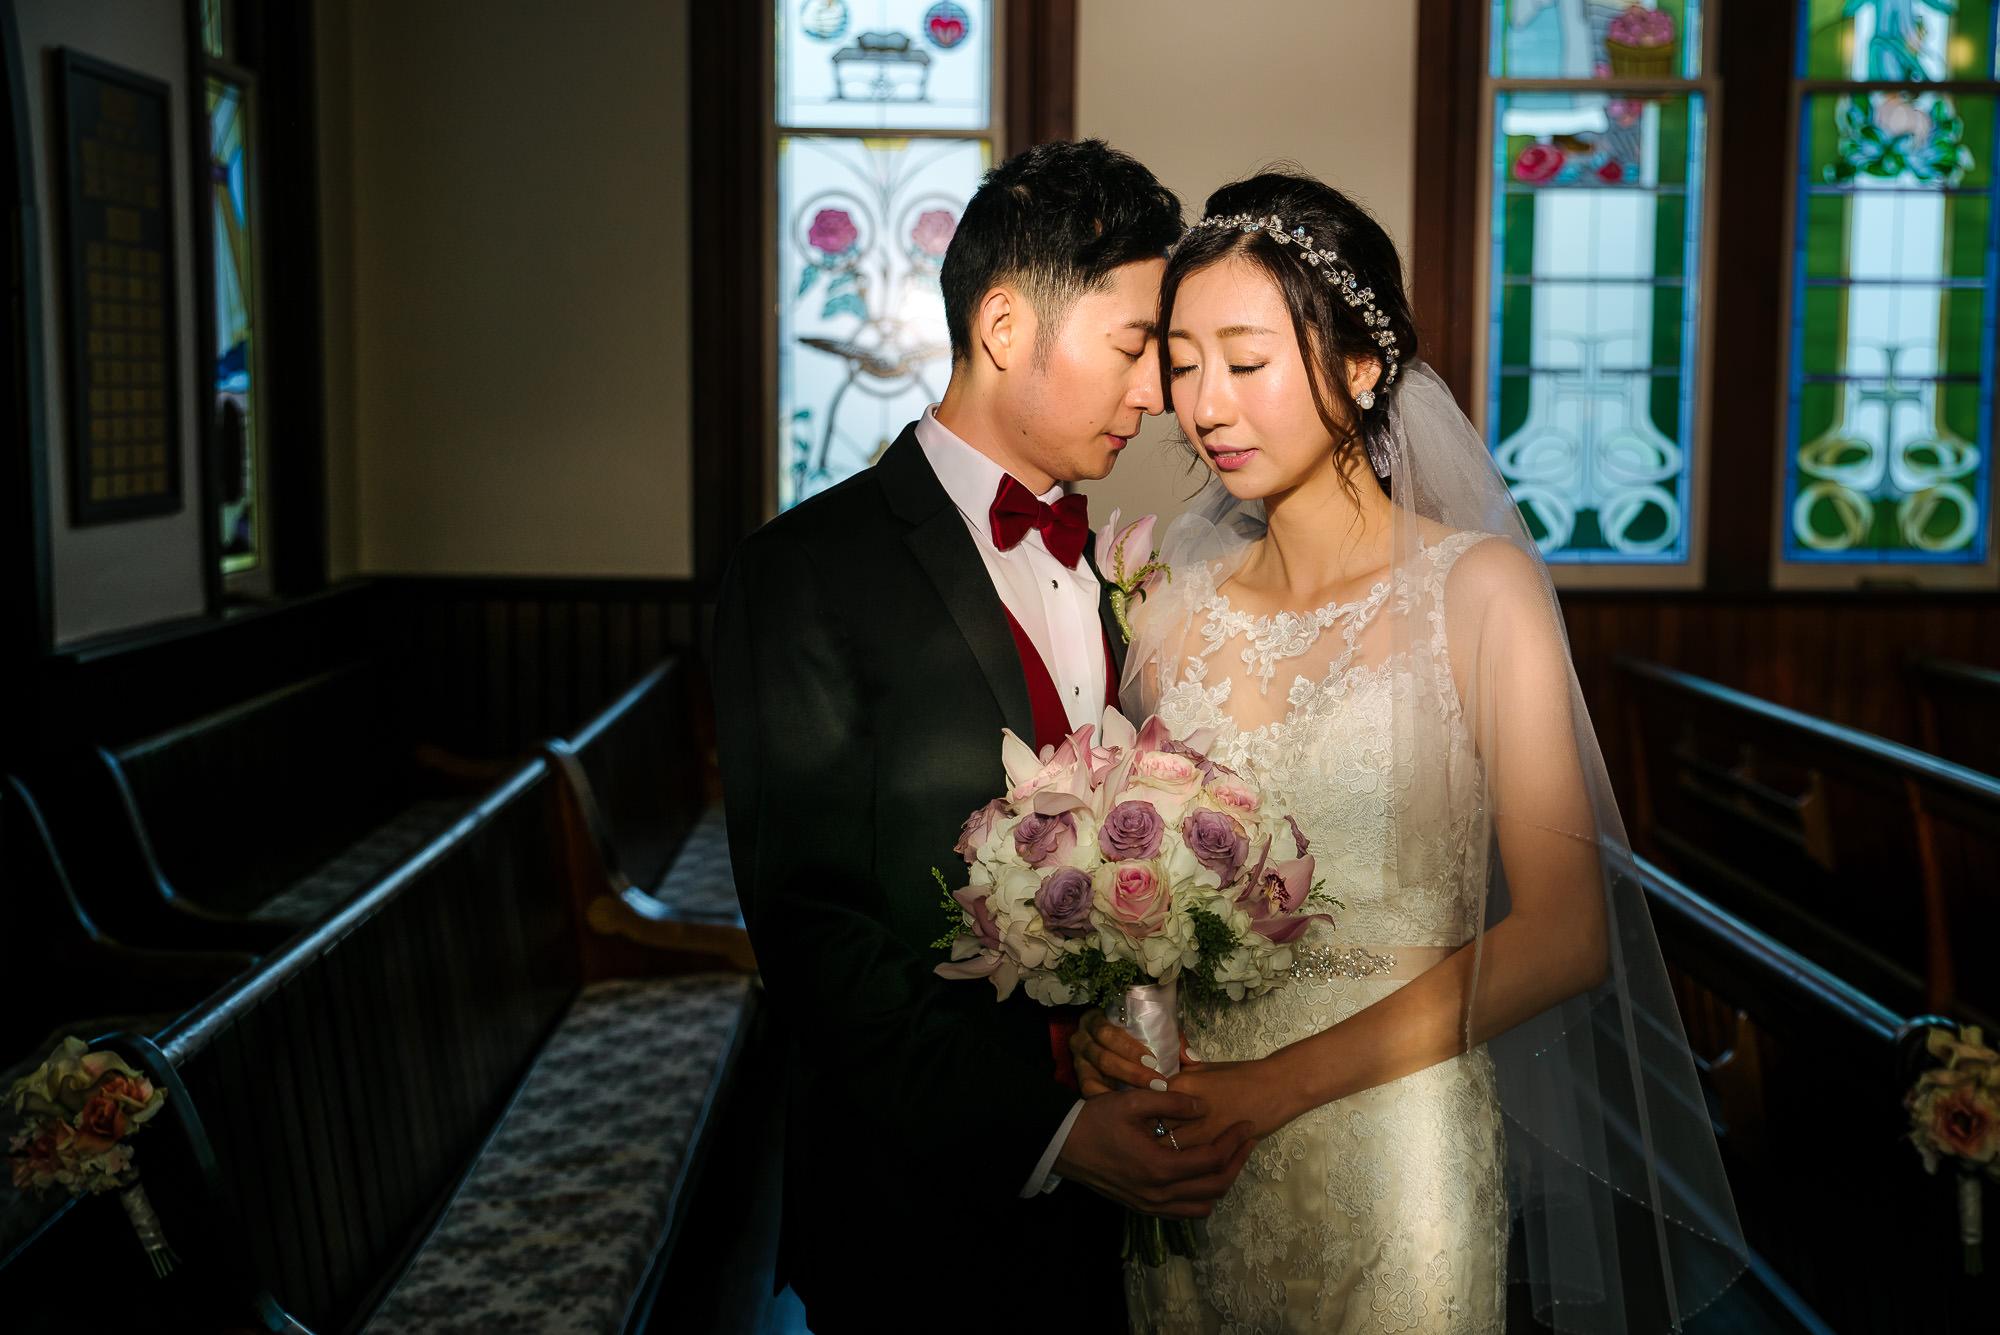 minoru_chapel_richmond_wedding_ceremony 16582817.jpg